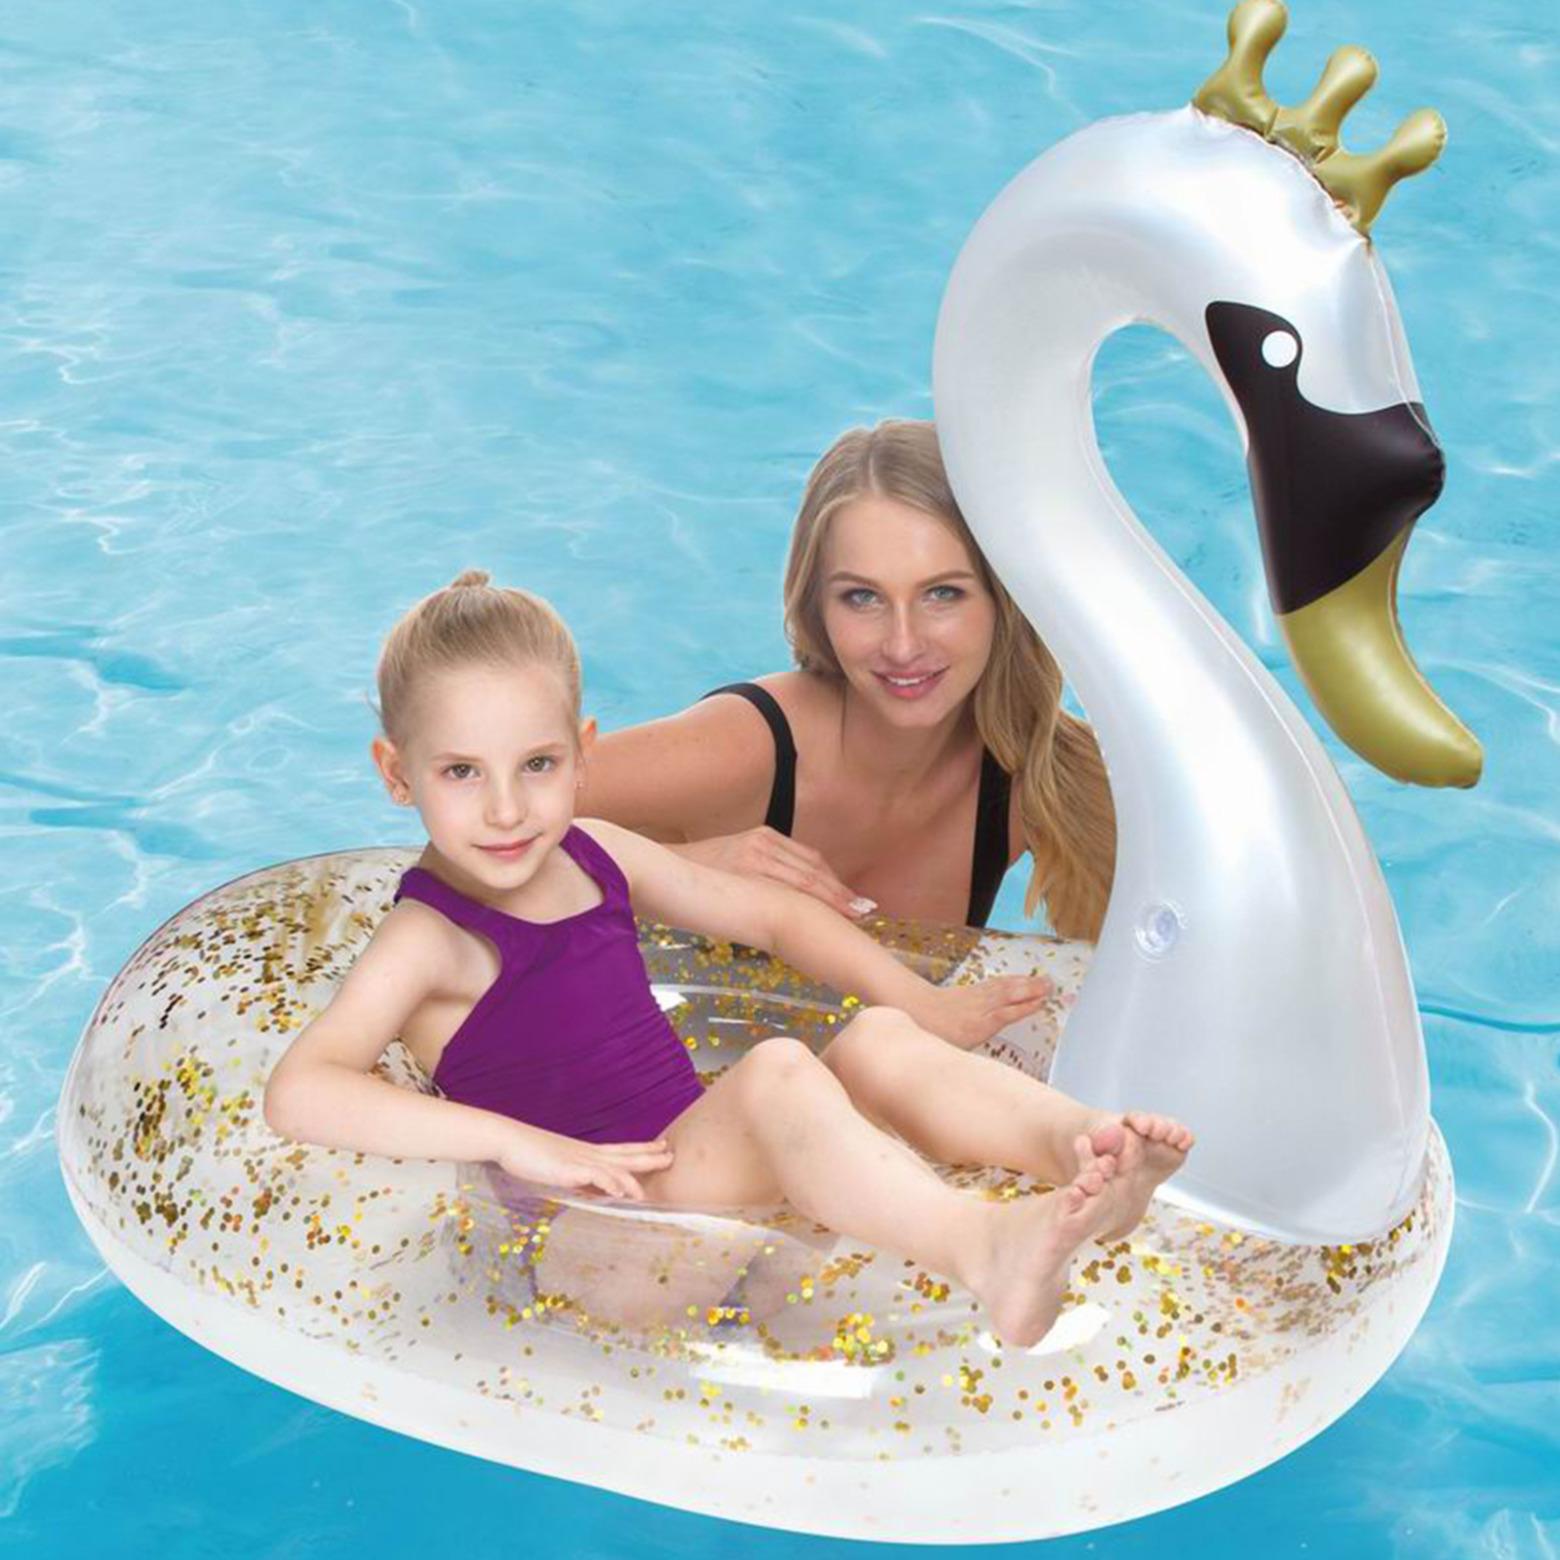 Zilver-gouden zwaan opblaasbare ride-on-luchtbed 71 x 113 x 90 cm kids speelgoed